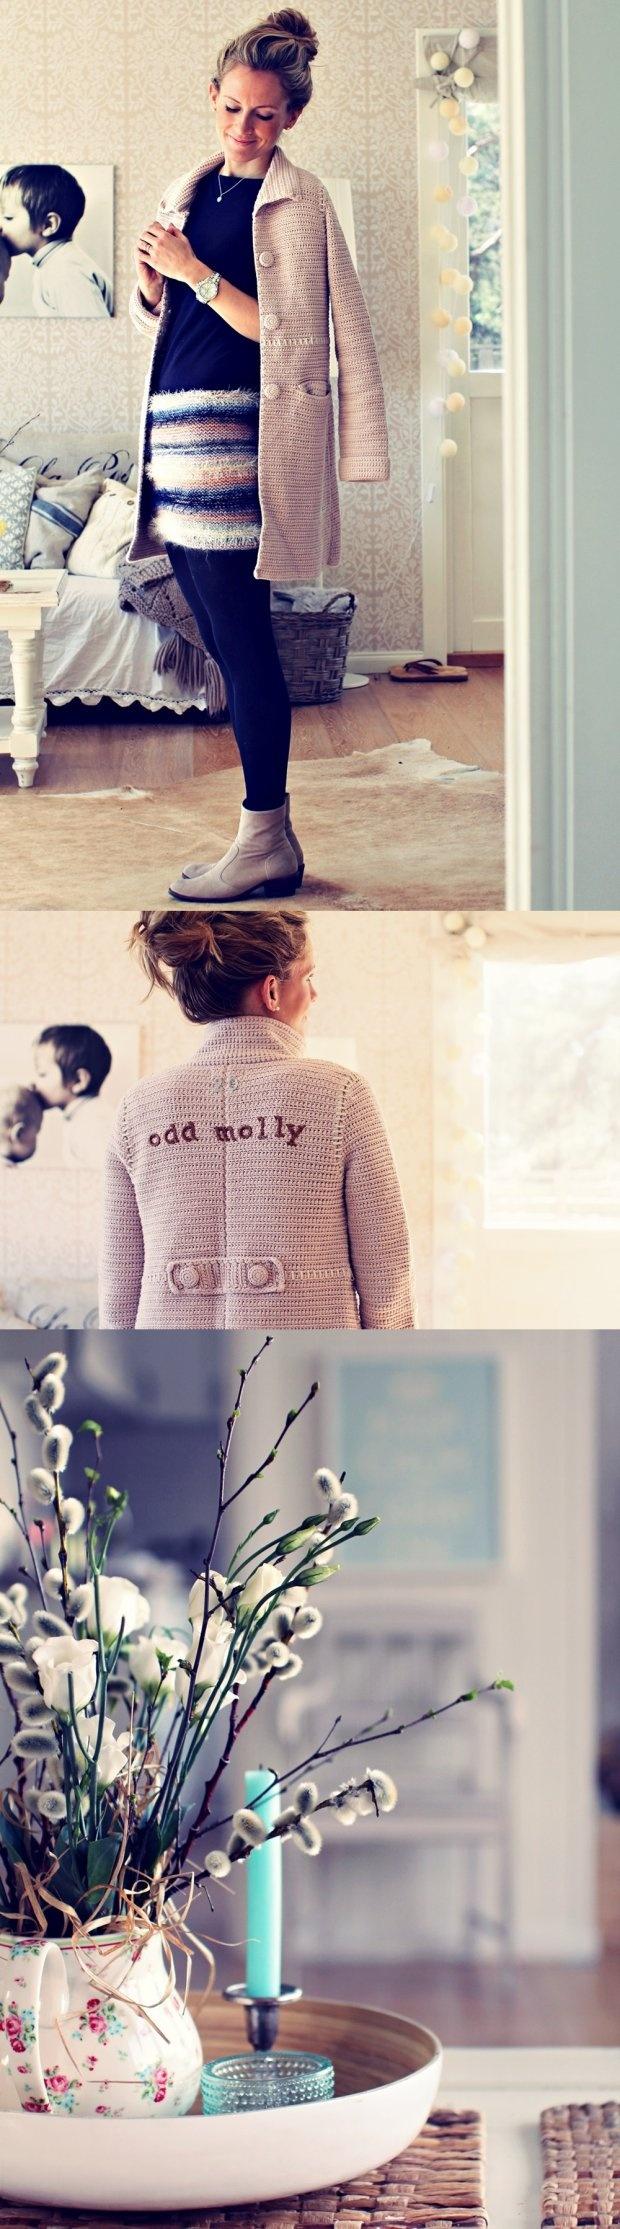 Odd Molly sweater coat...so cute! Kalastajan vaimo - ME NAISET